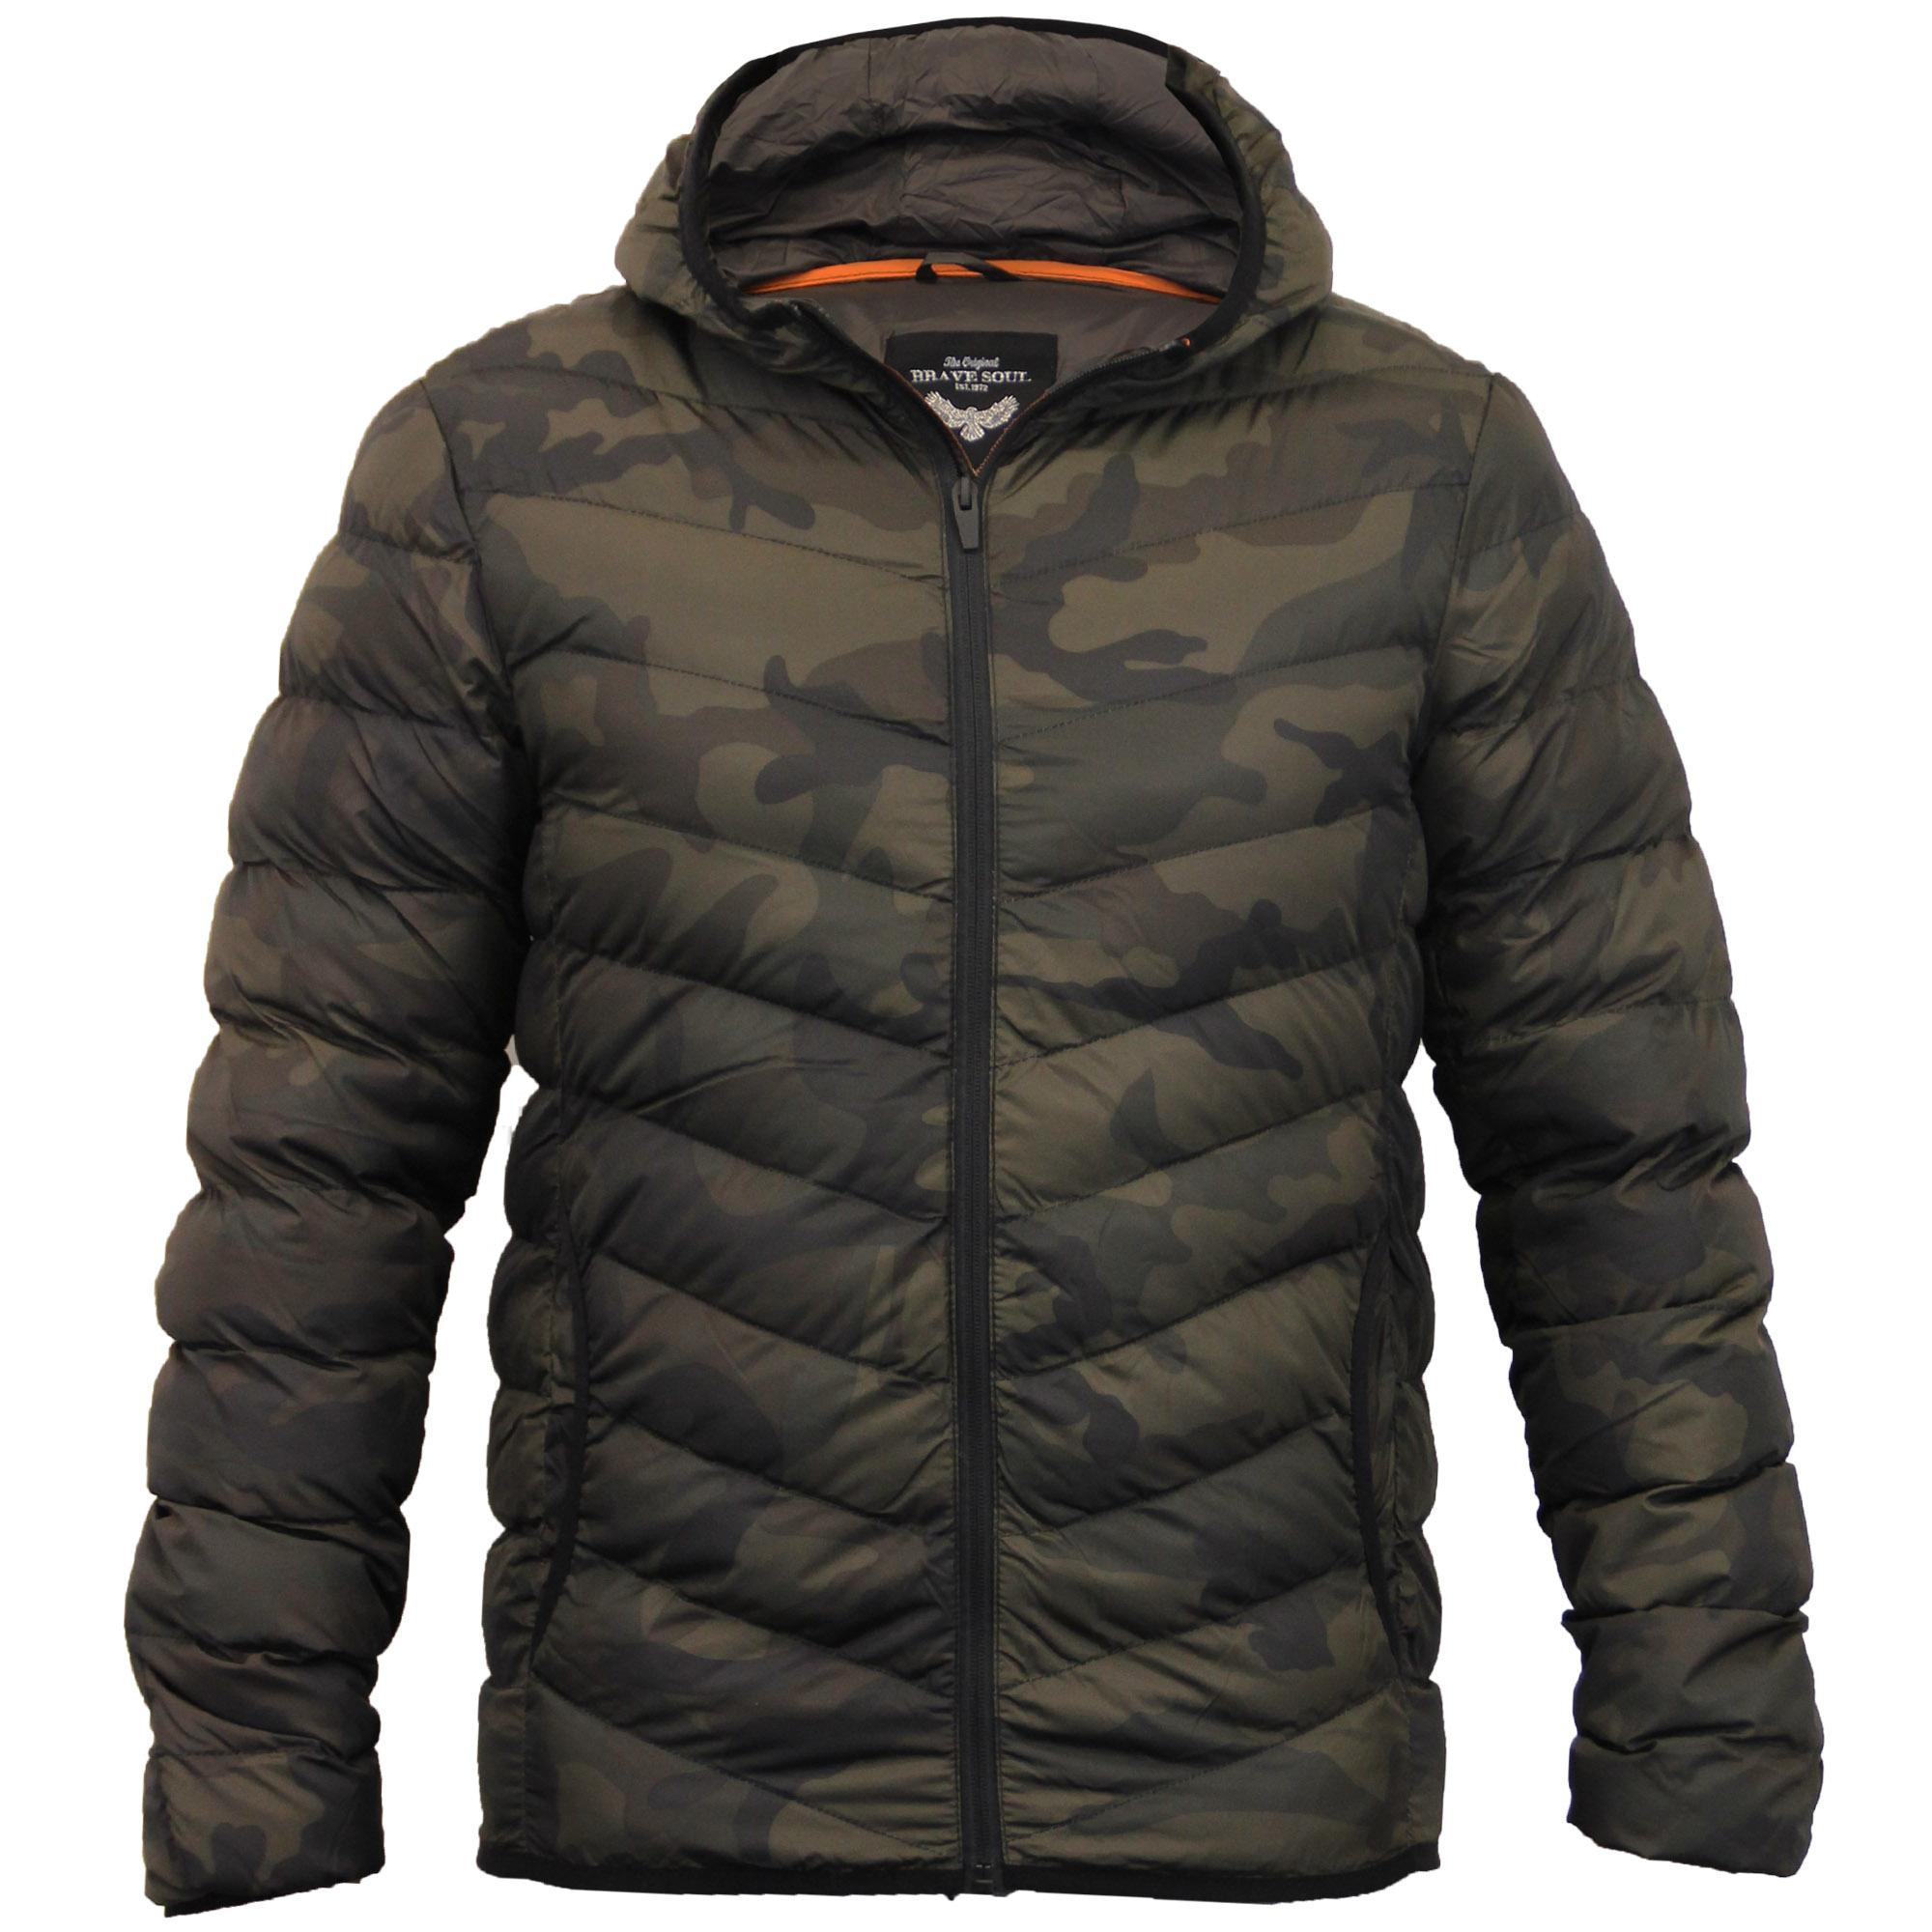 mens bubble jacket threadbare coat hooded camo military. Black Bedroom Furniture Sets. Home Design Ideas